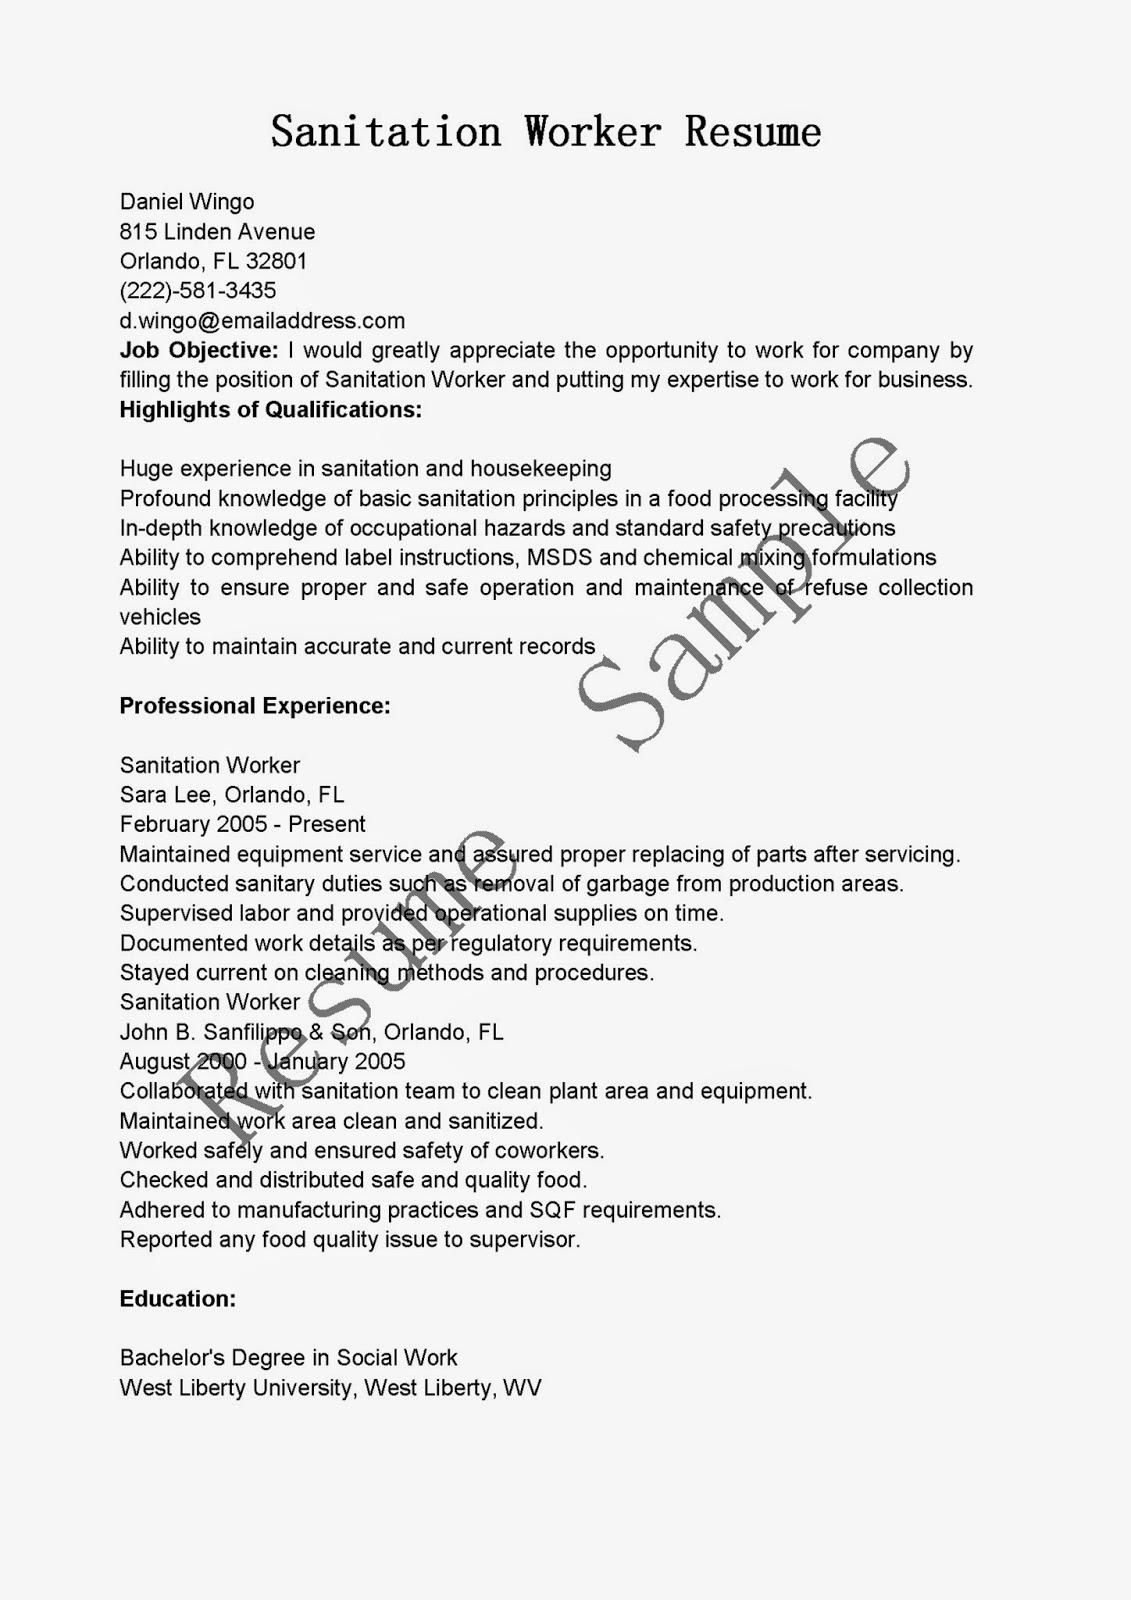 Resume Samples Sanitation Worker Resume Sample